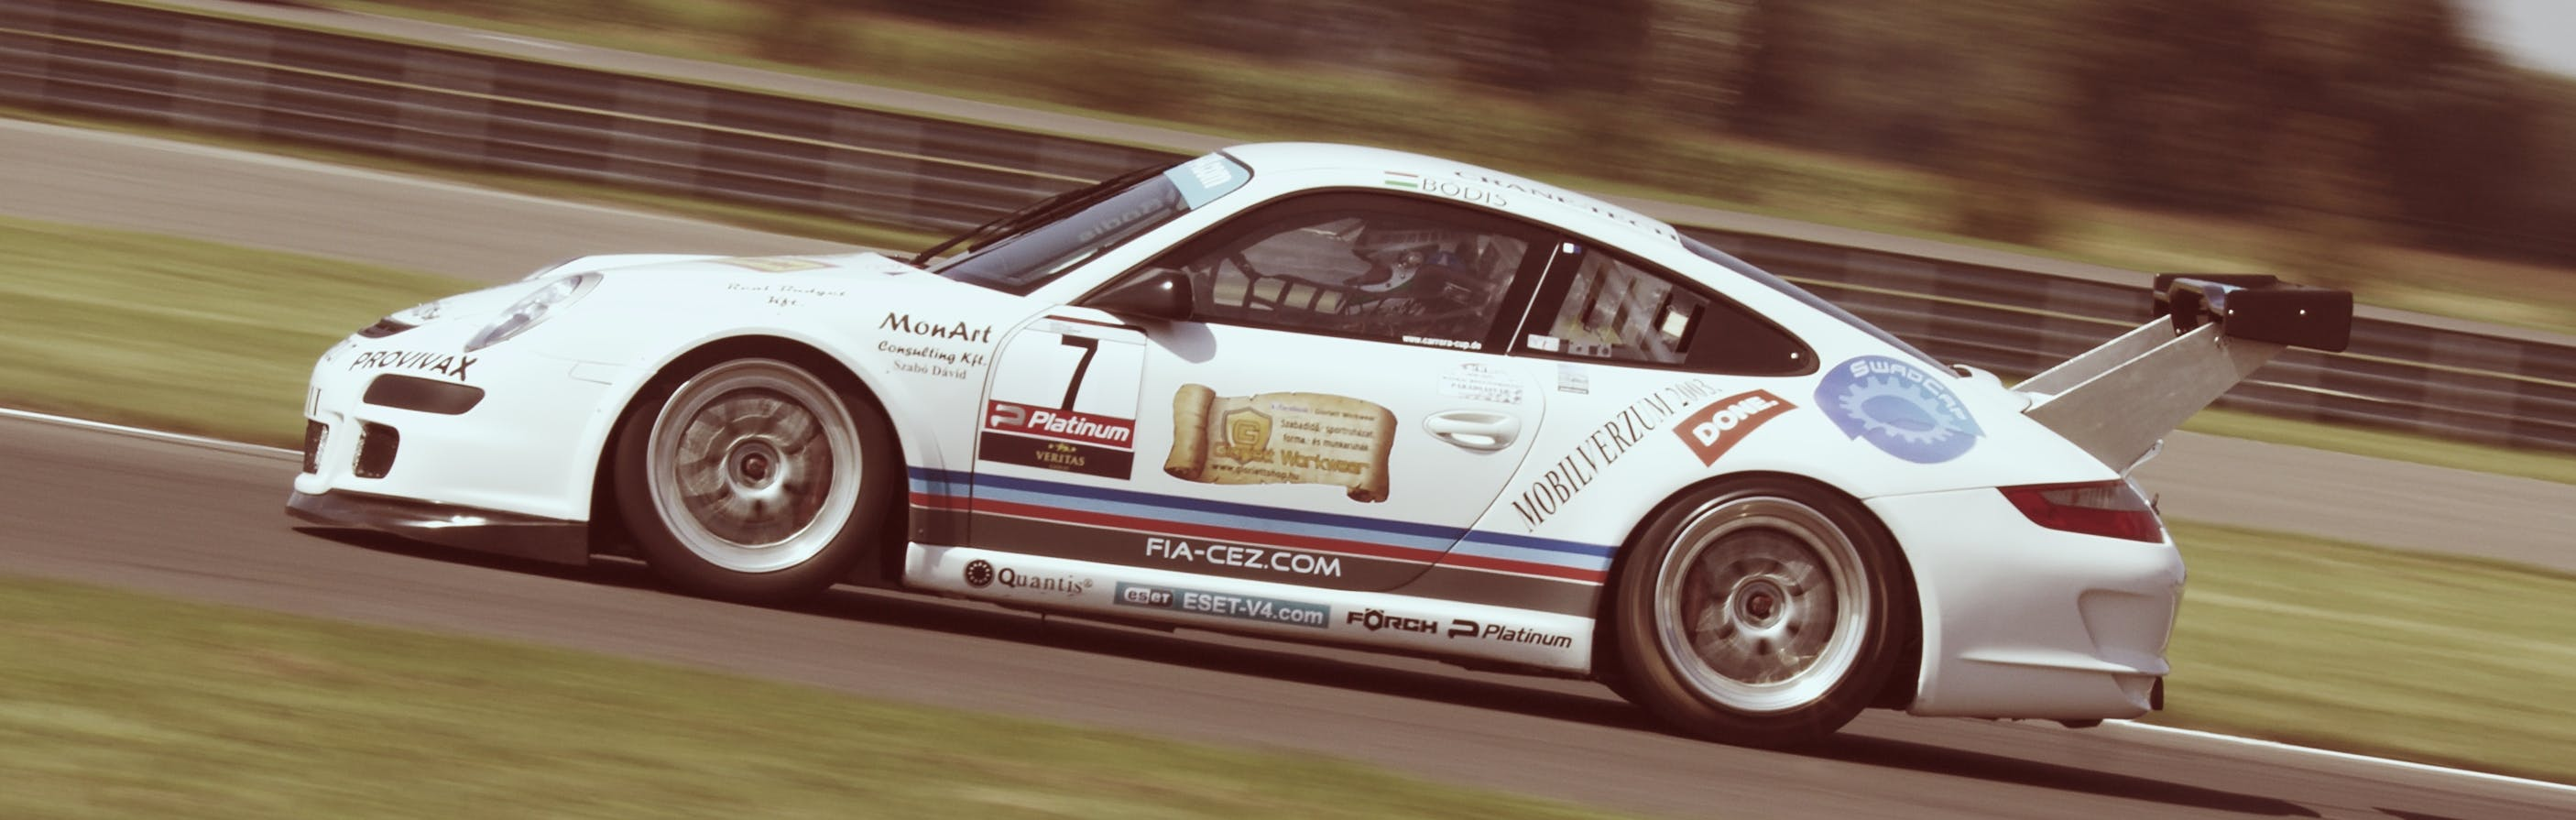 Free stock photo of porsche, race, motor sport, slovakia